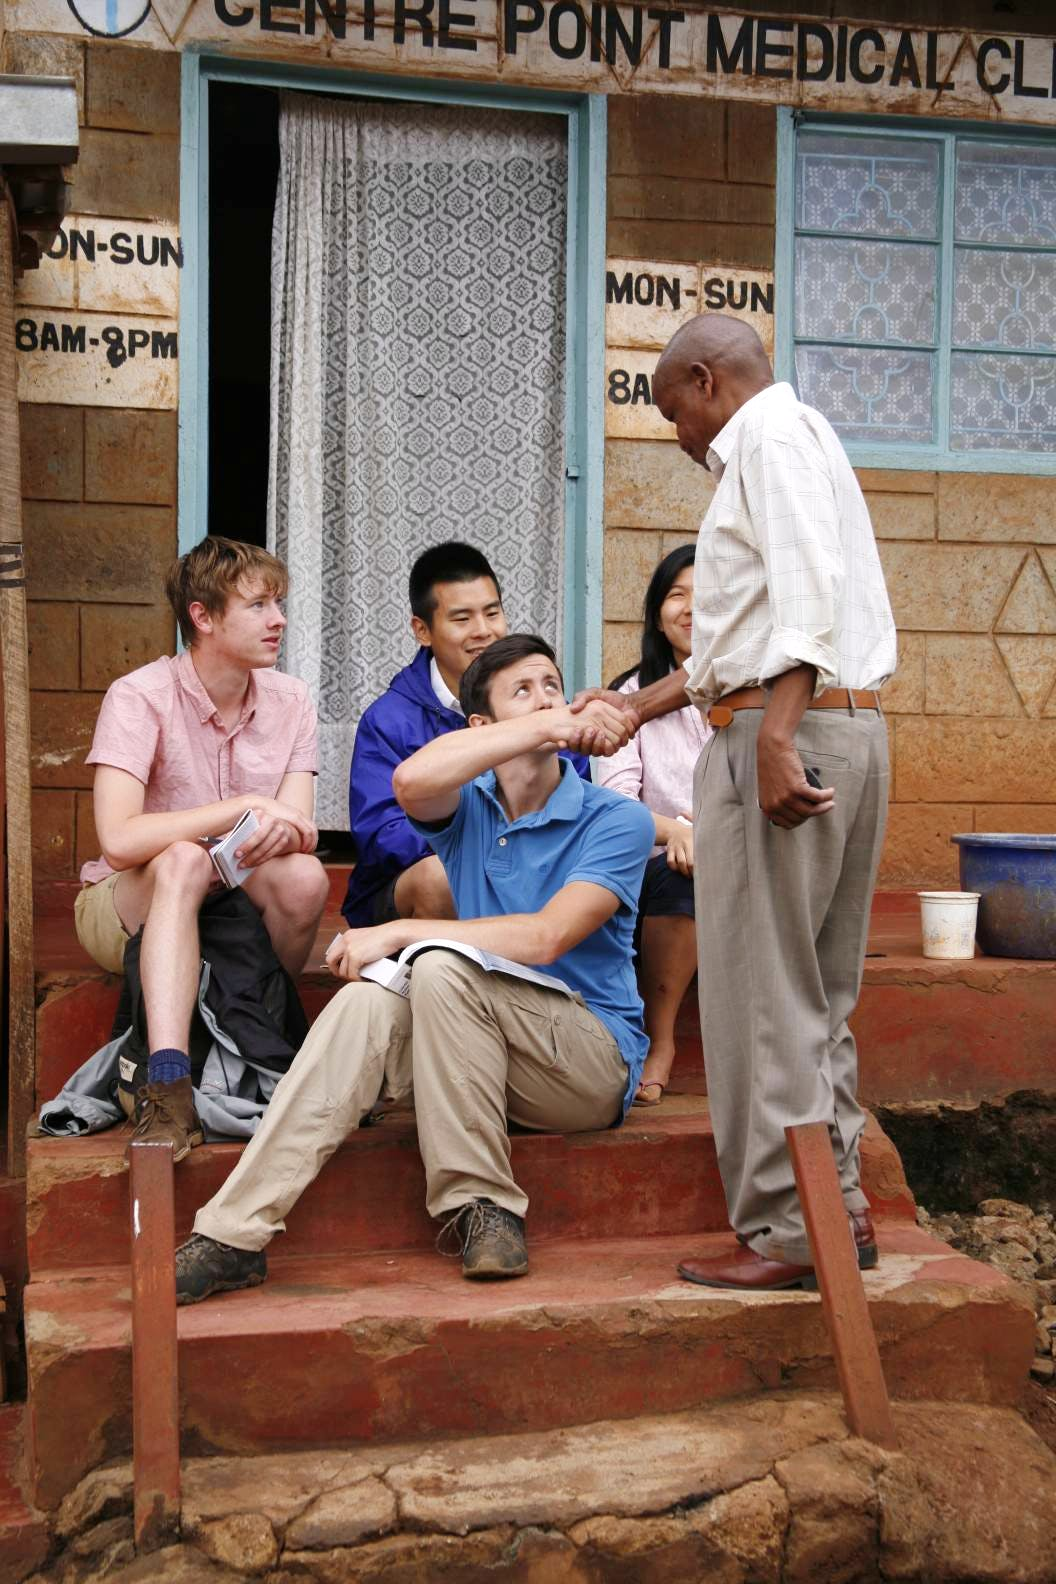 HIV Prevention and Outreach